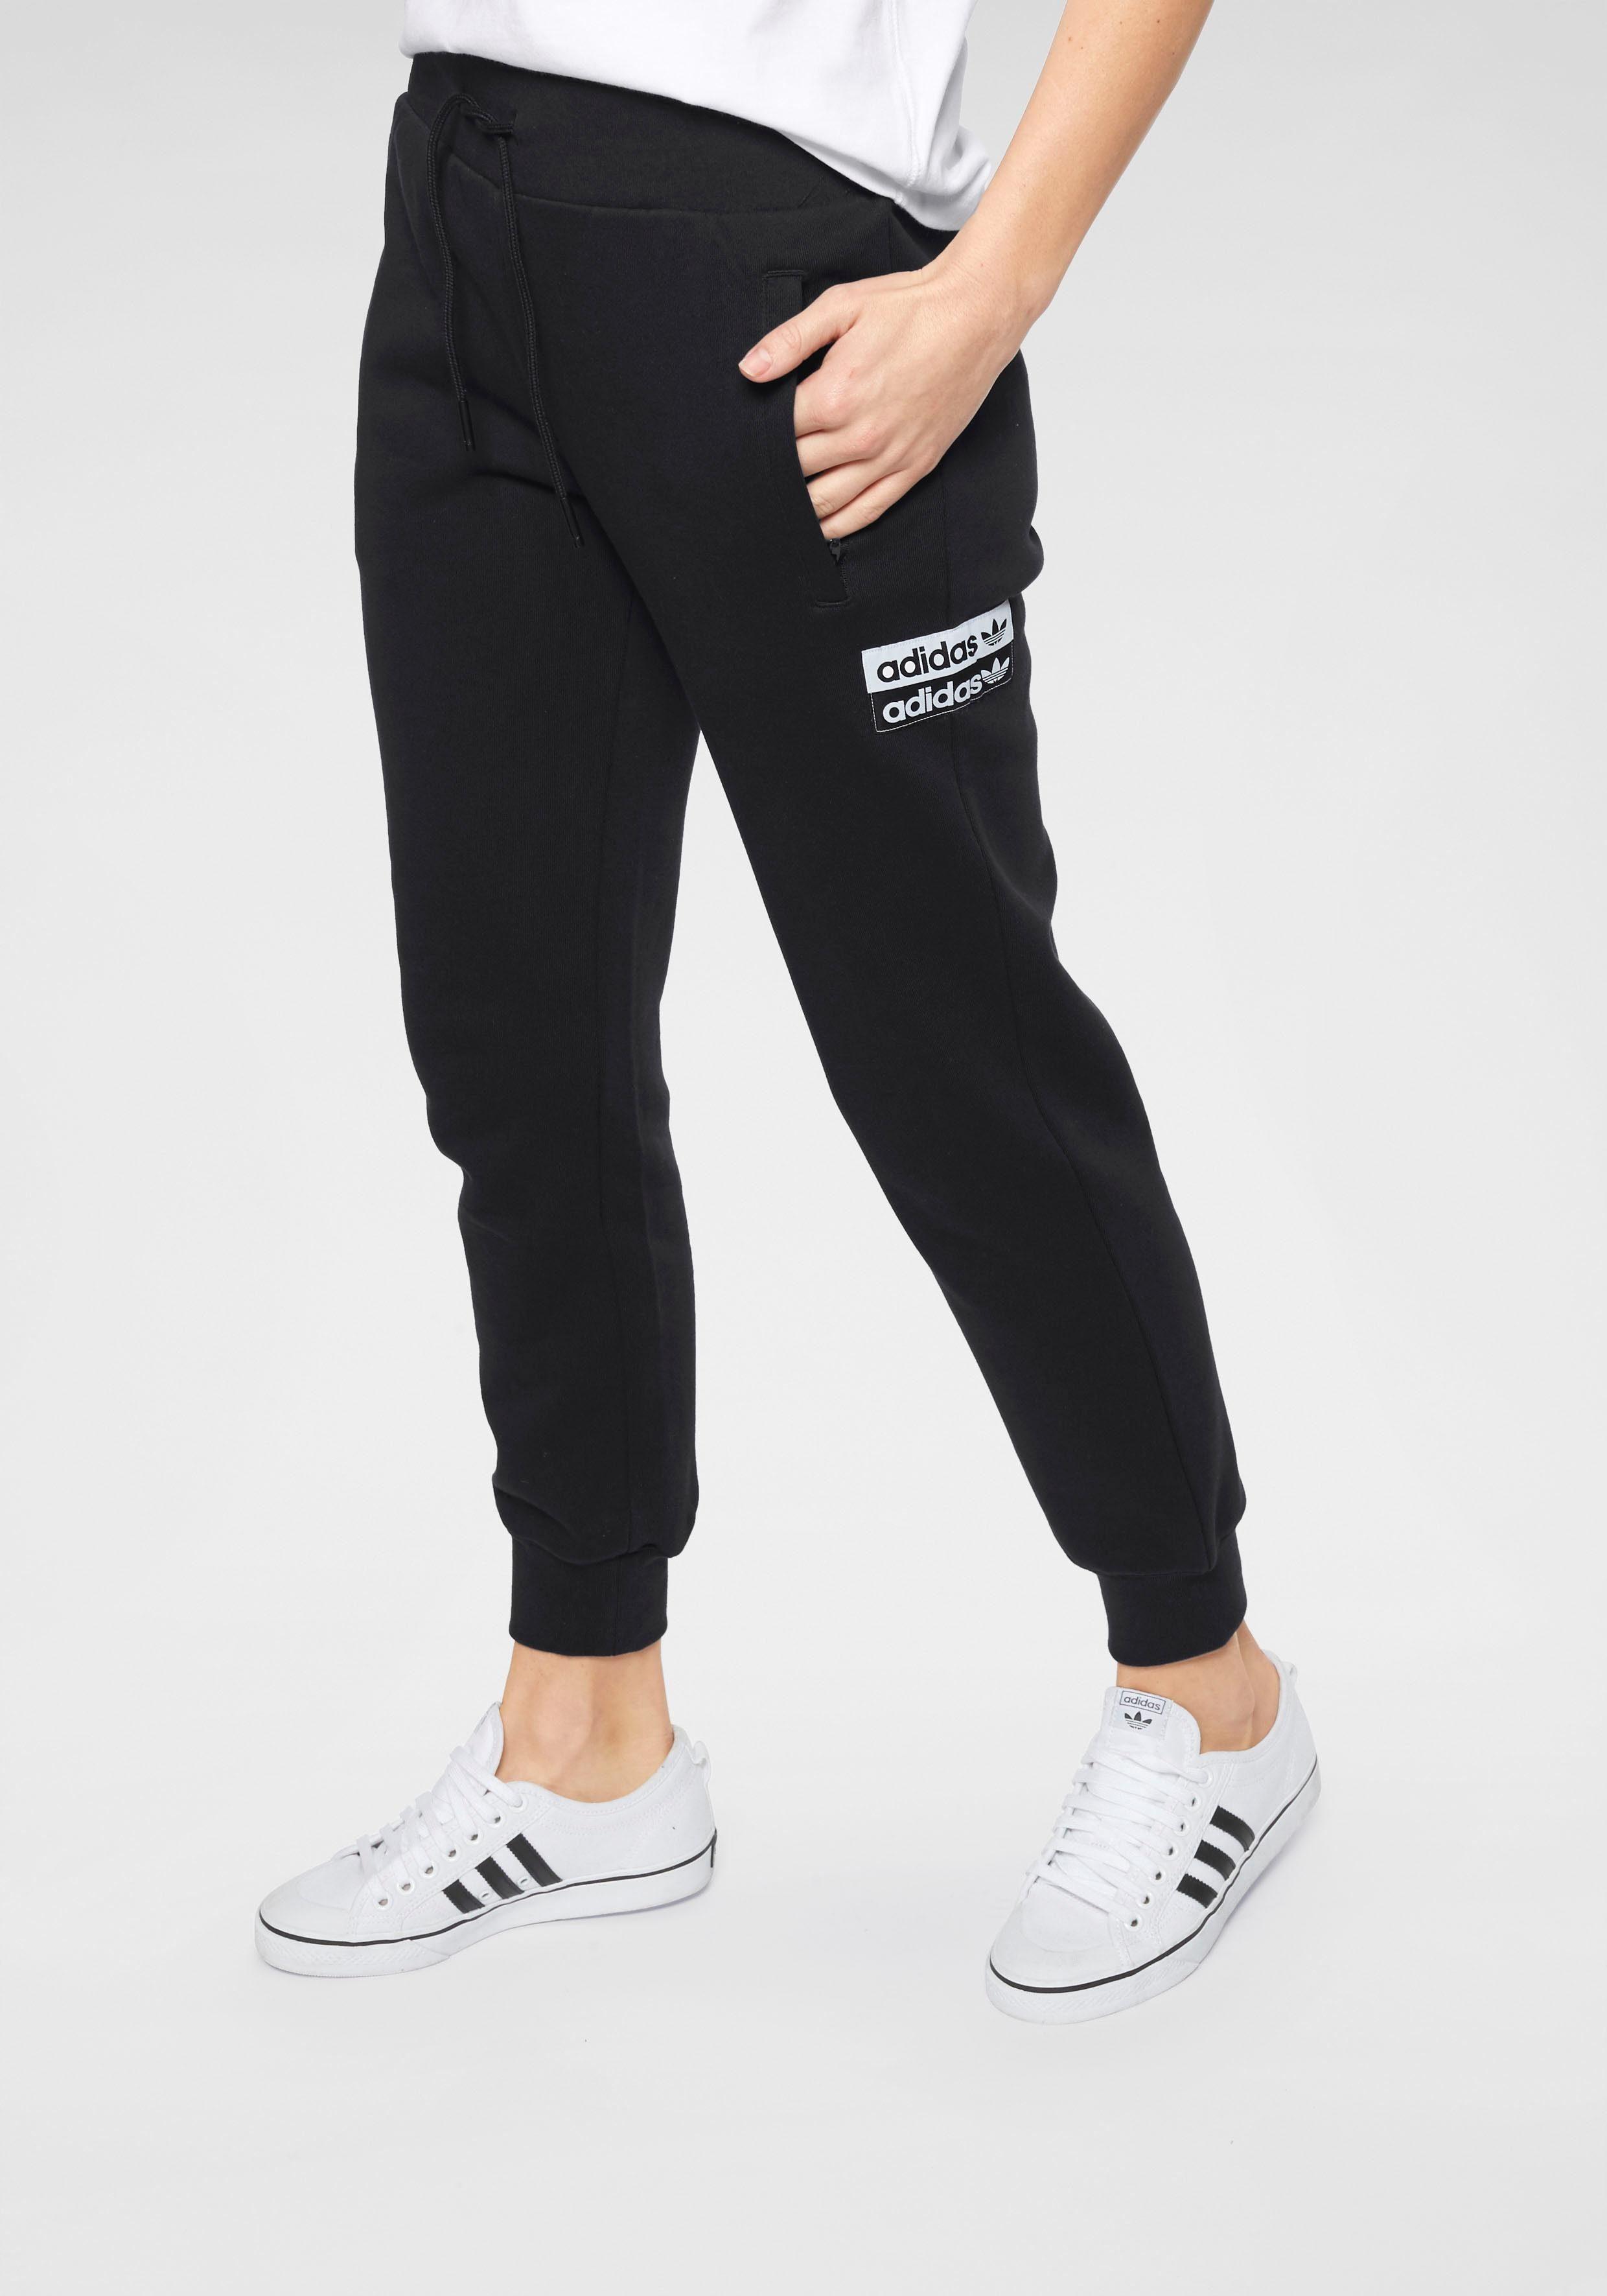 adidas Originals Jogginghose »CUF PANT« kaufen   OTTO